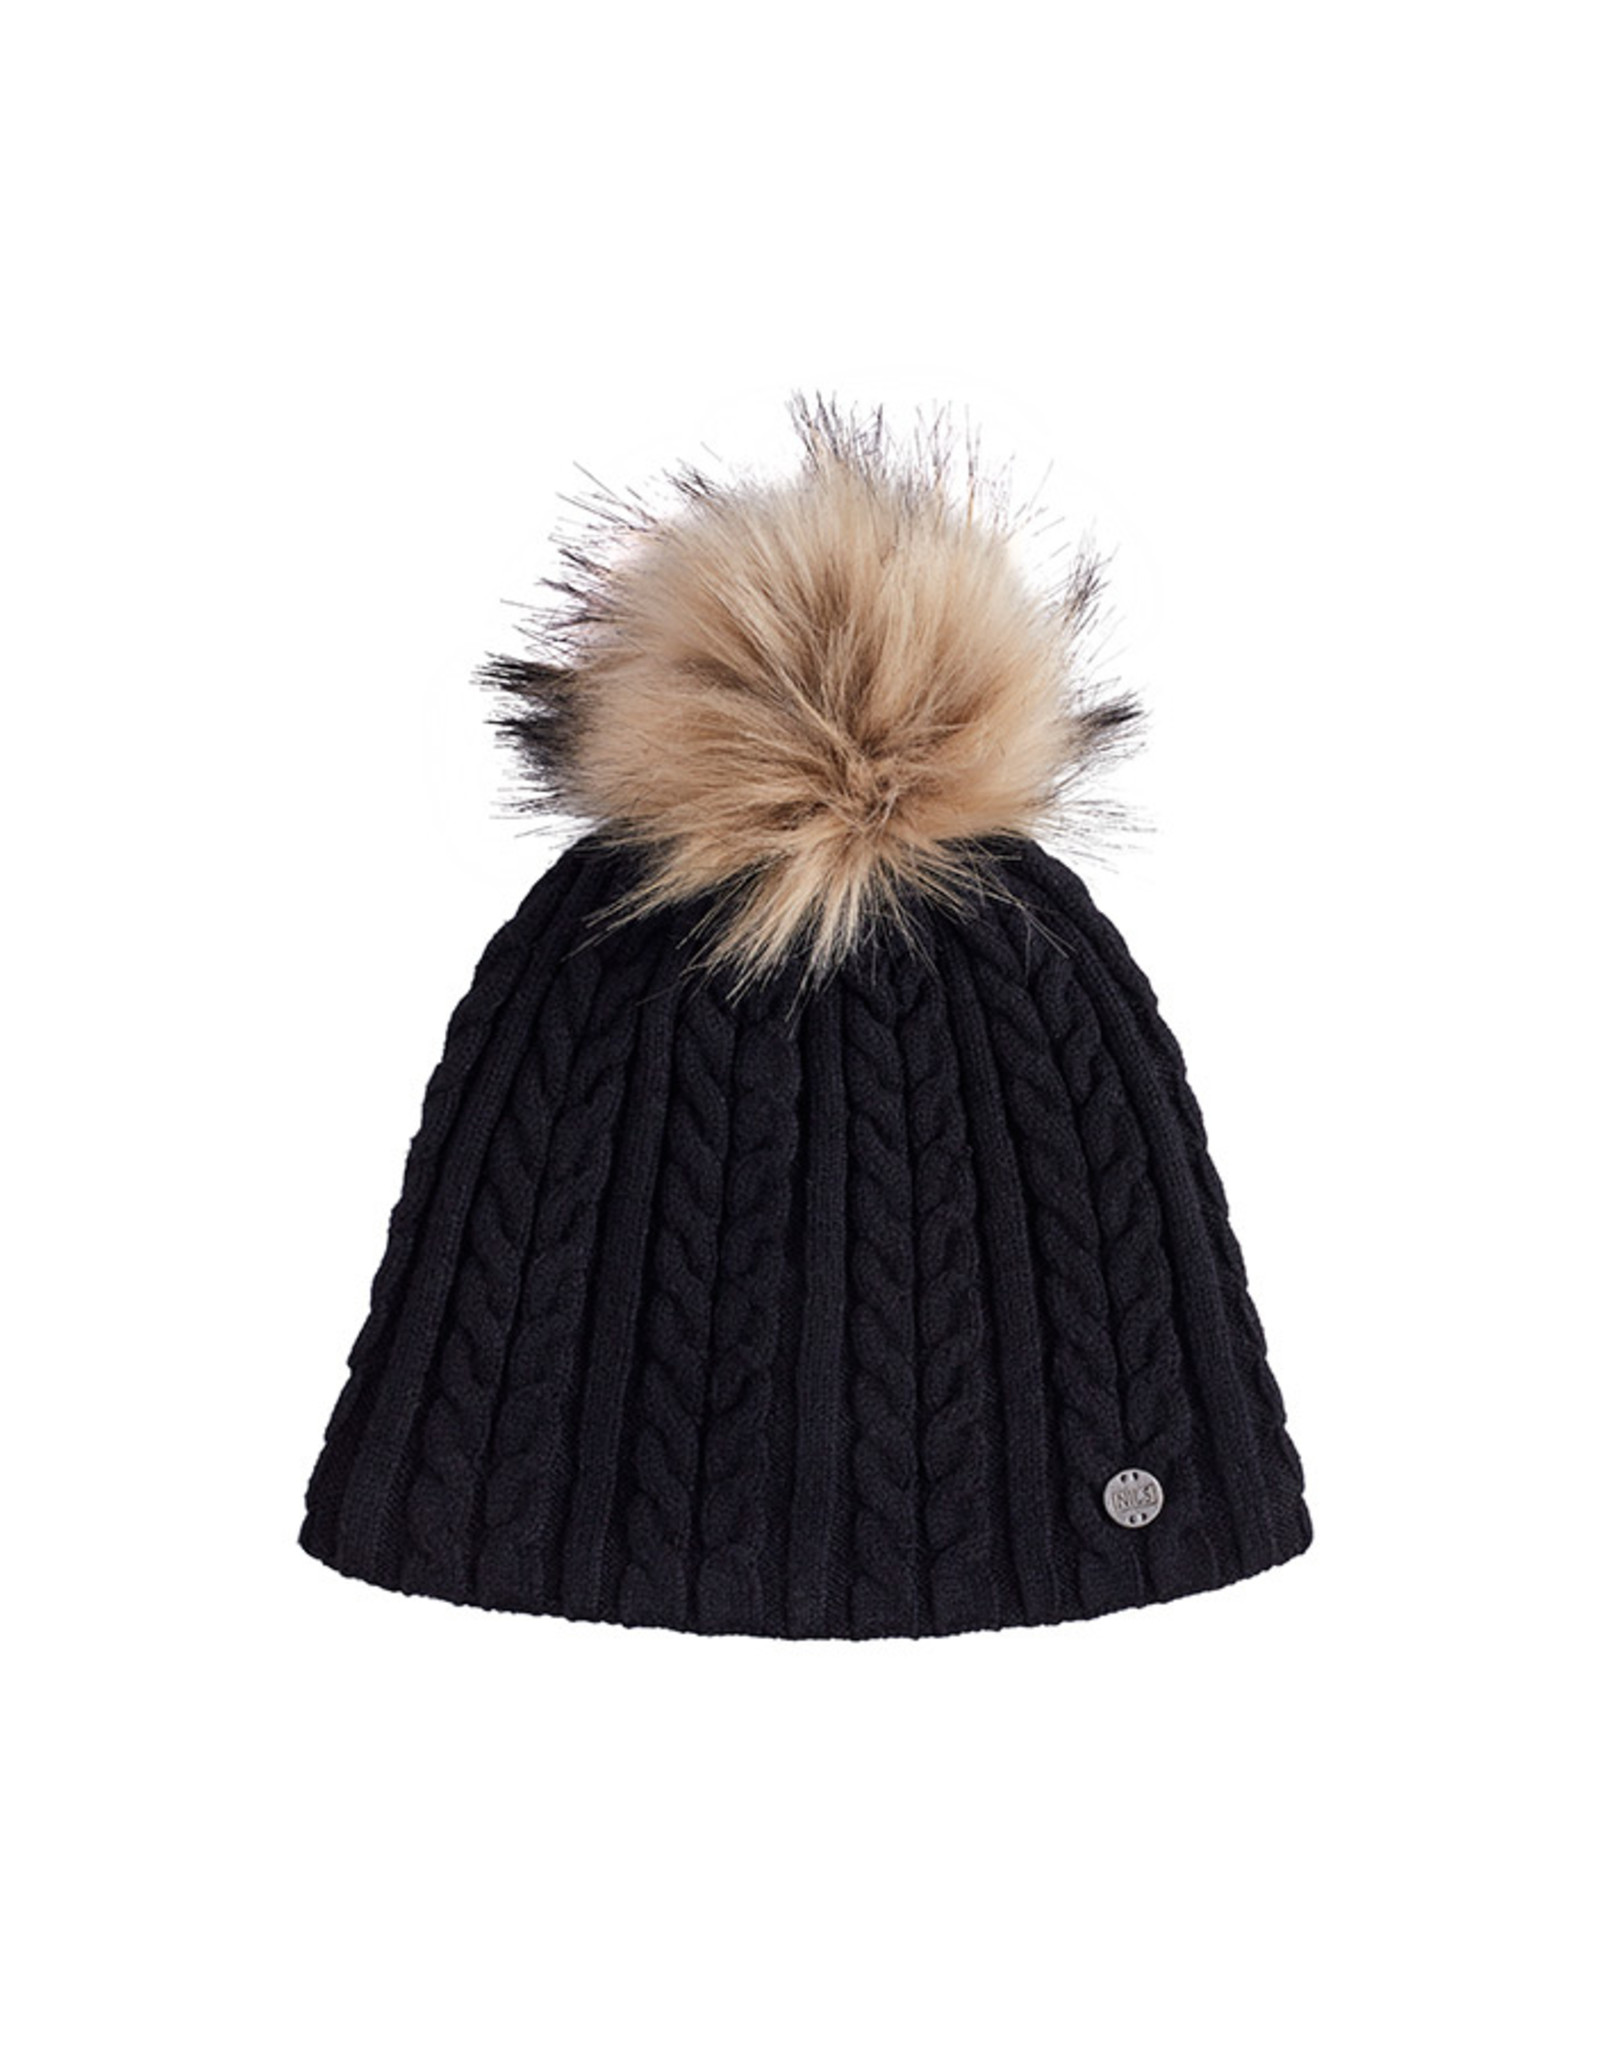 NILS NILS Frankie Knit Hat